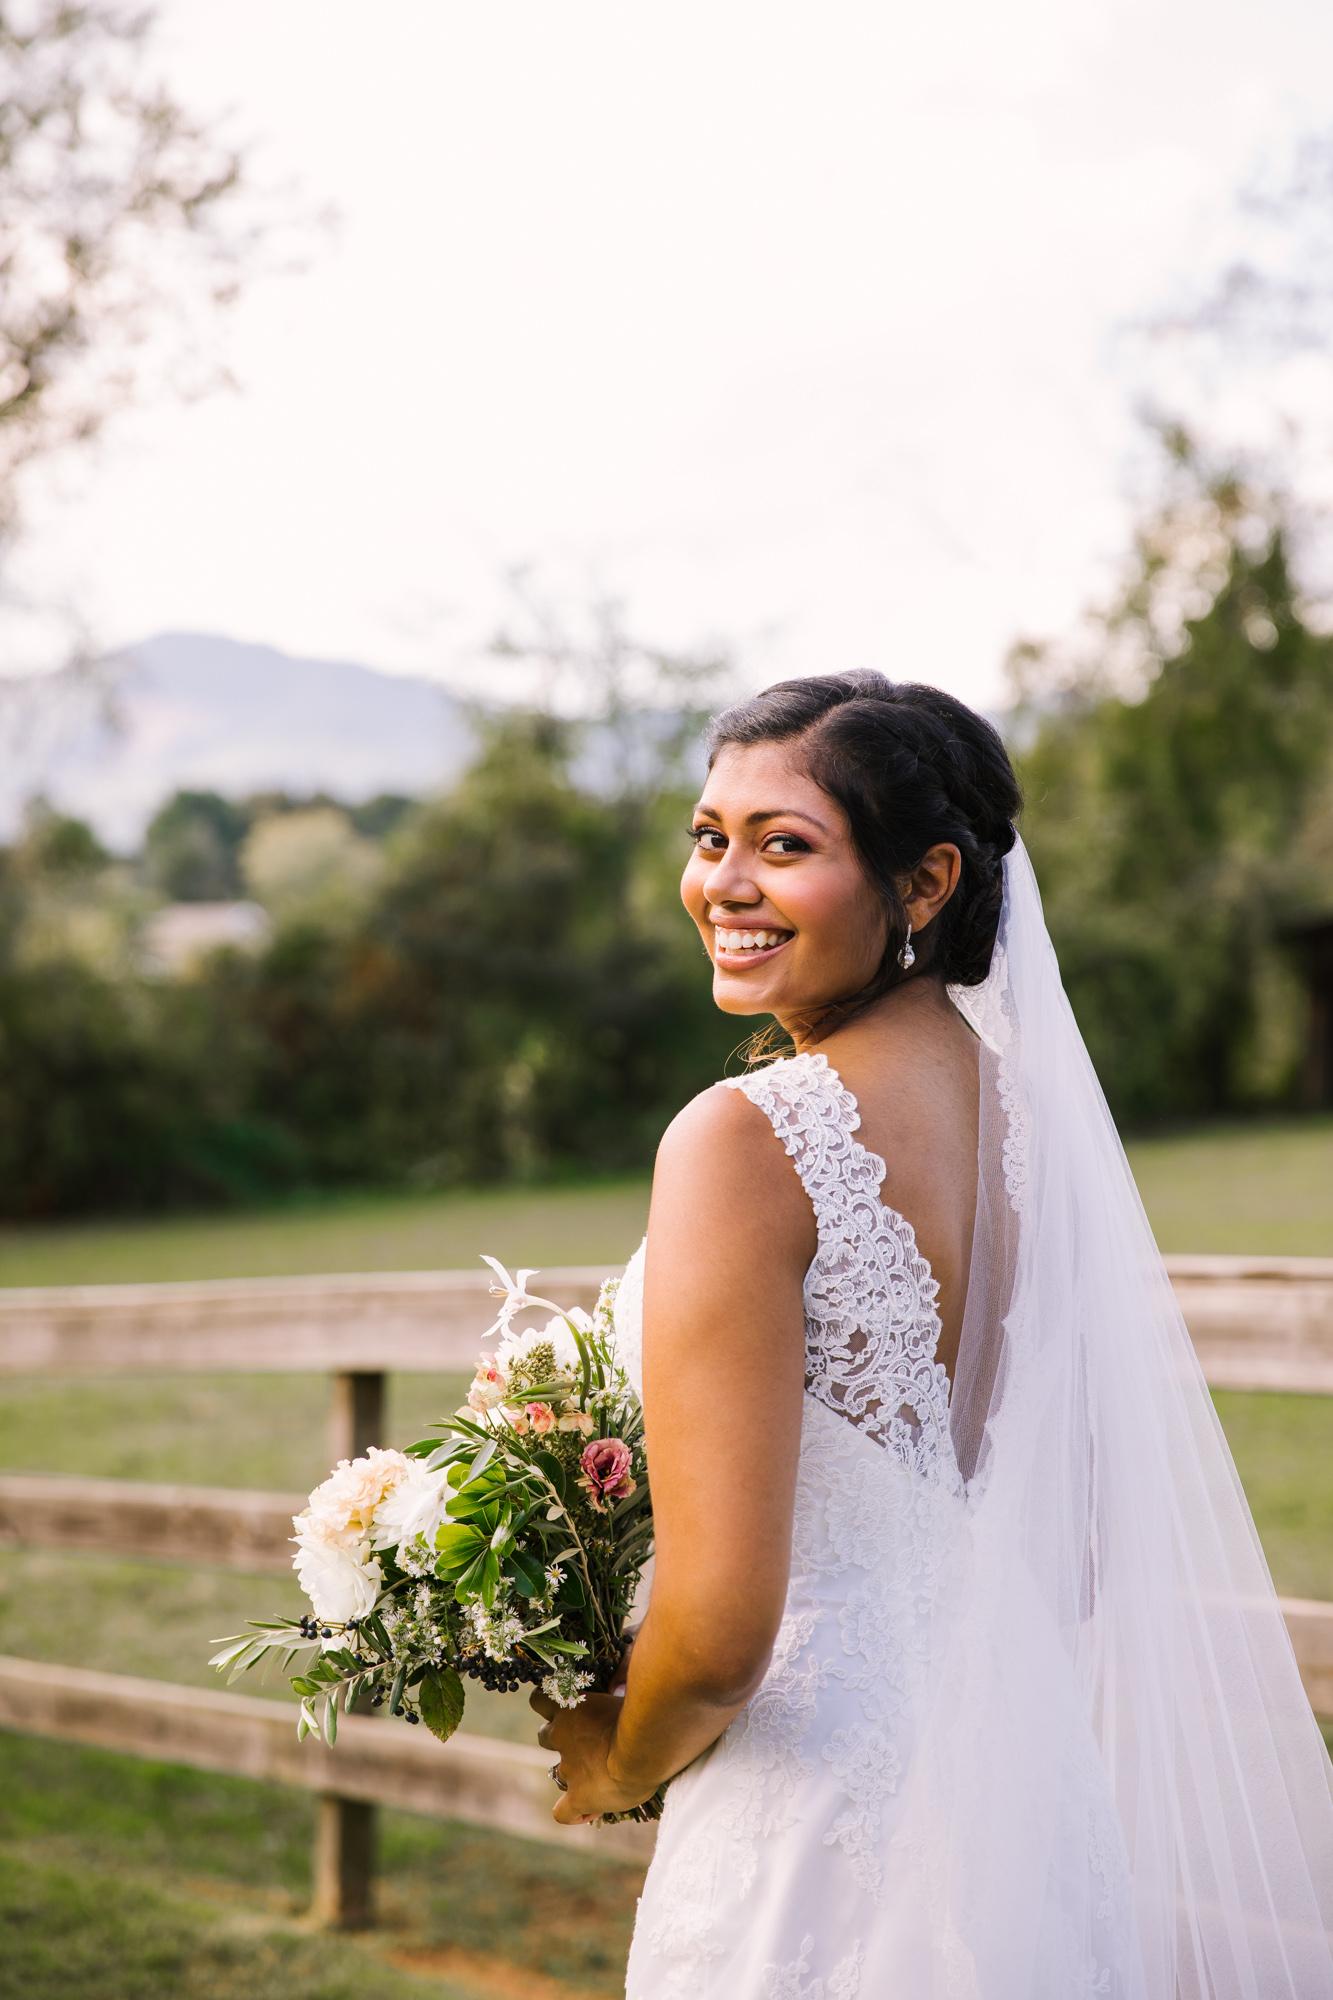 Waynesville NC Wedding Photography | Bridal Portrait Looking over shoulder